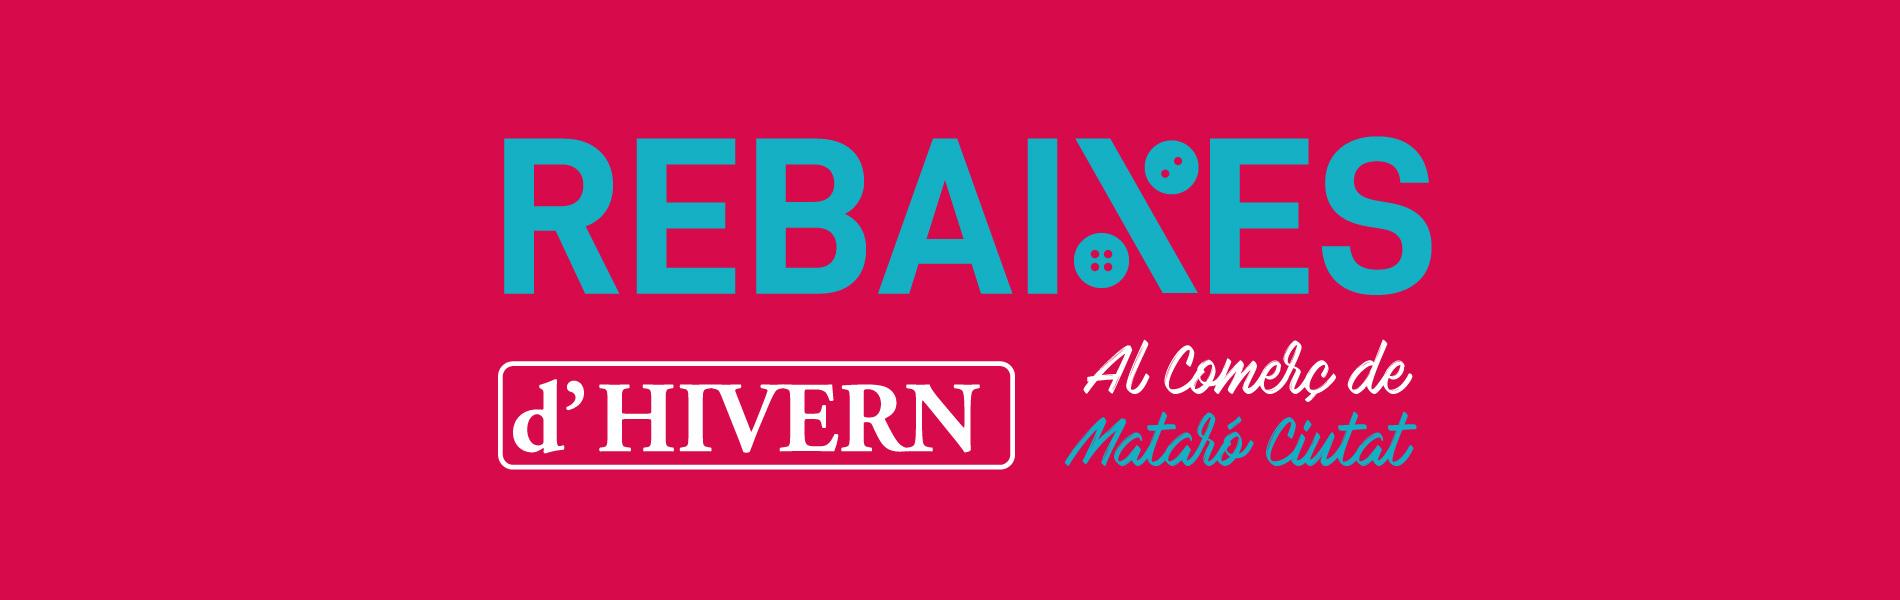 SliDe-rebaixes-HIVERN-2020-vermell